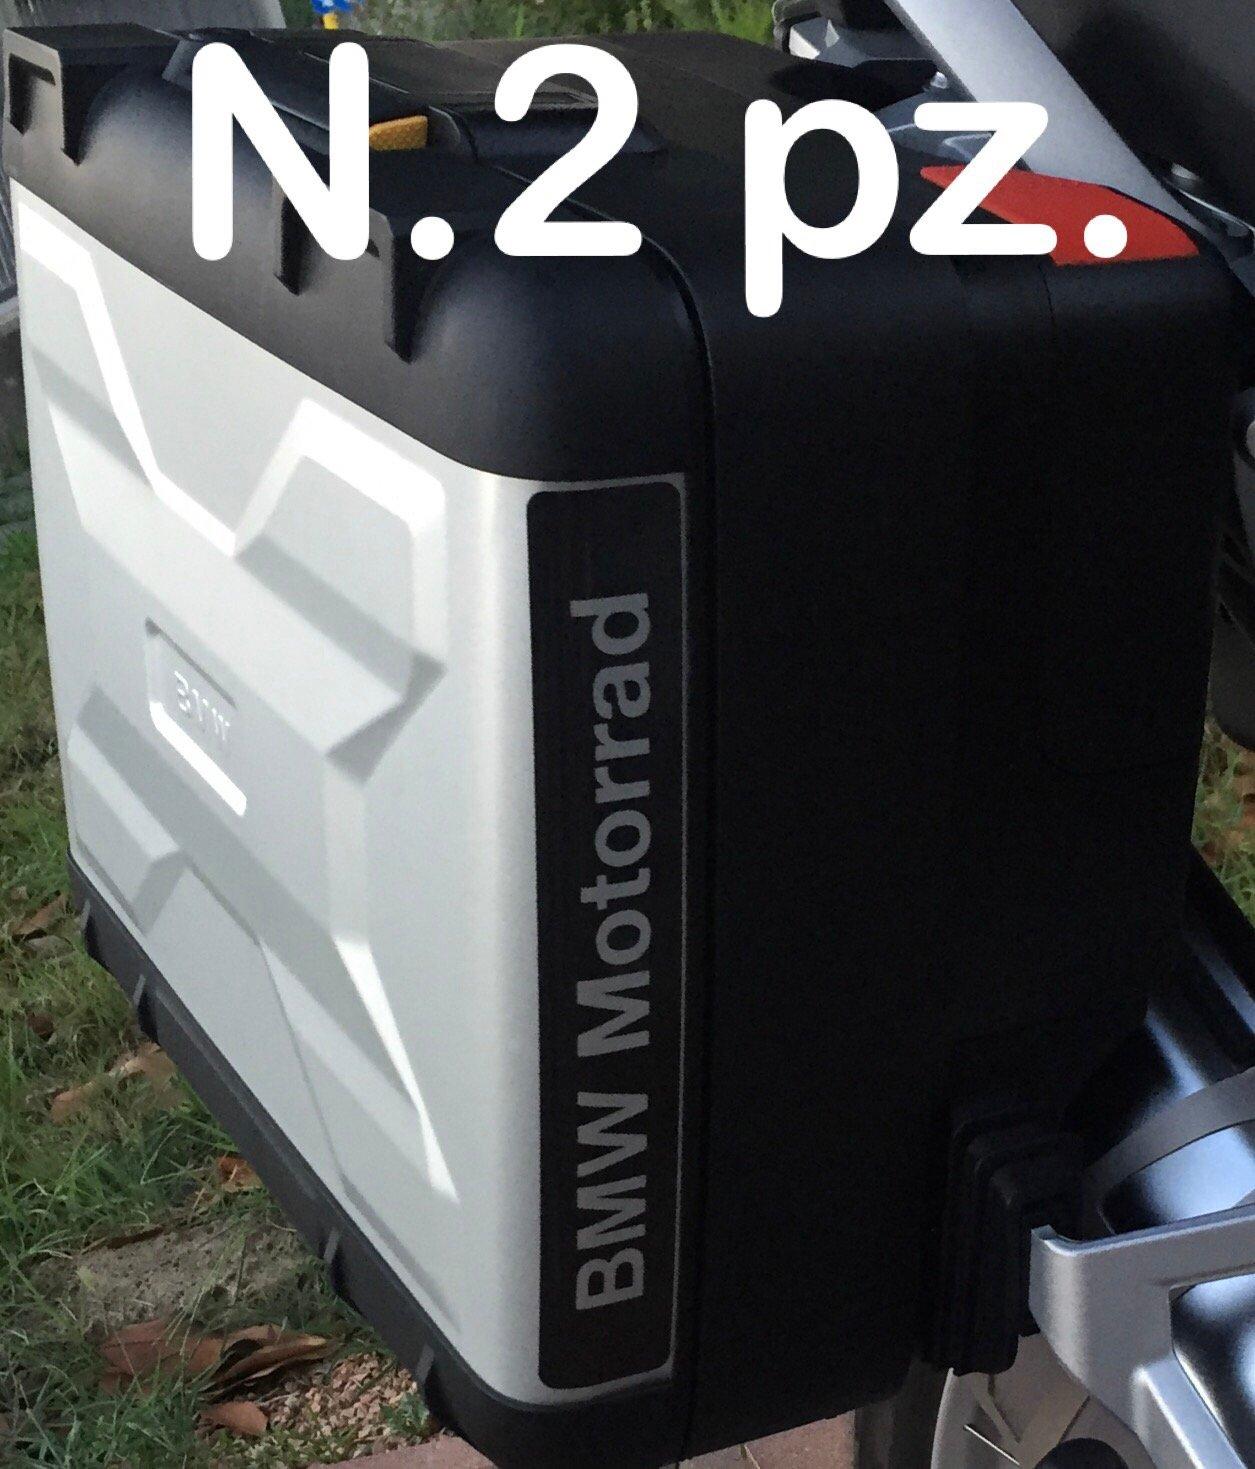 N.2 pz. RIFRANGENTI REFLECTIVE BMW MOTORRAD STICKERS ADESIVI NERO BLACK VARIO BAGS THE1200STICKERS